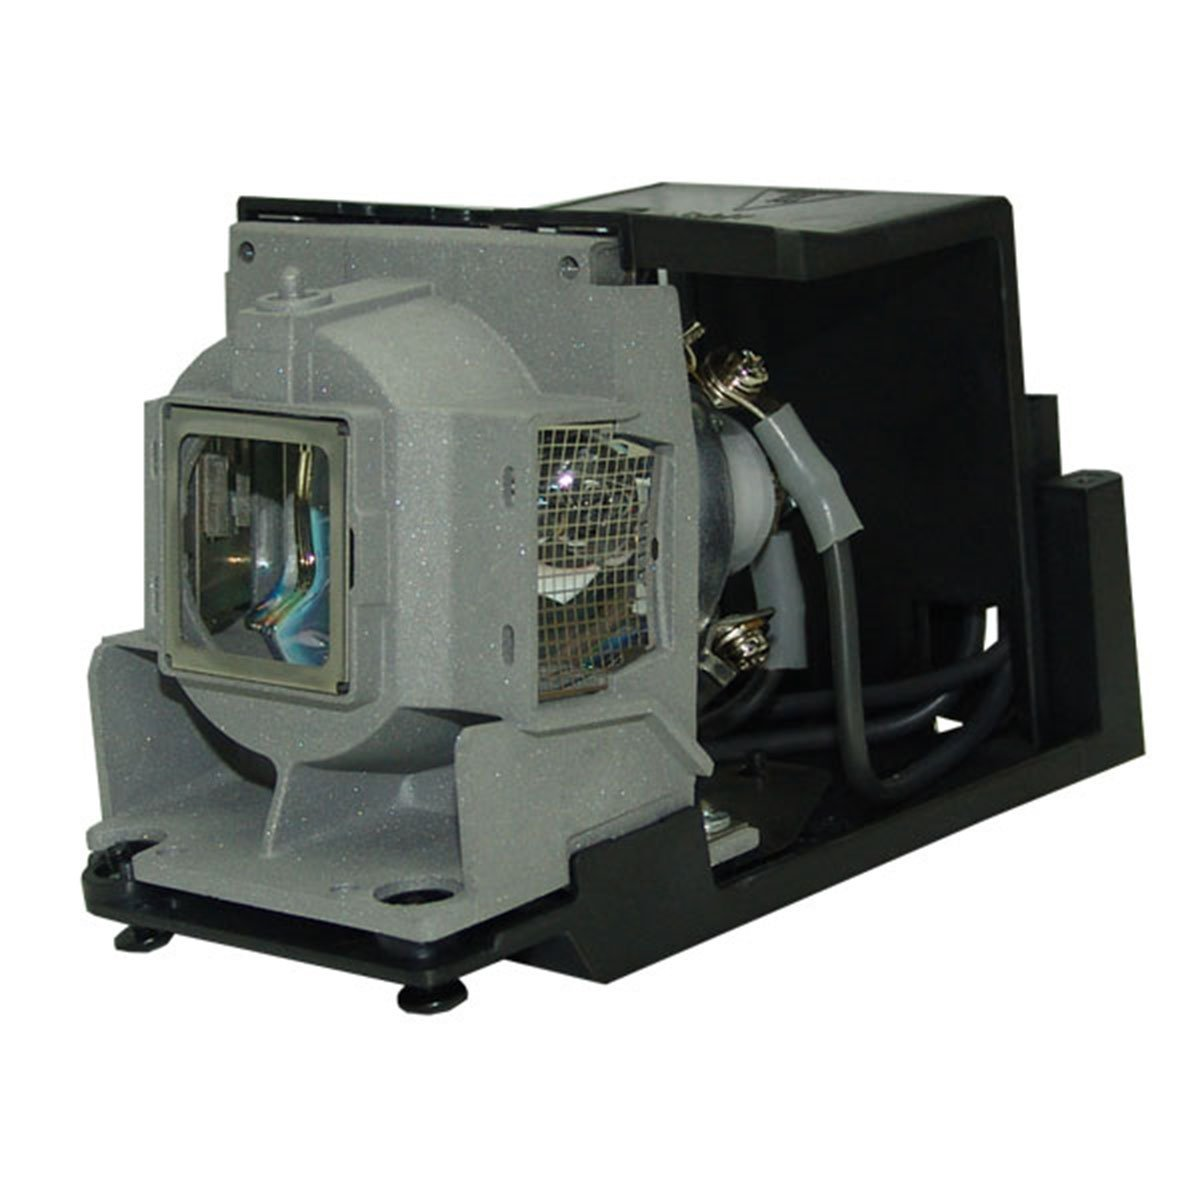 Projector Lamp Bulb TLPLW23 TLP-LW23 for TOSHIBA TDP-T360 TDP-T420 TDP-TW420 with housing projector lamp for toshiba tlp 661 bulb p n tlplu6 150w uhp id lmp3570